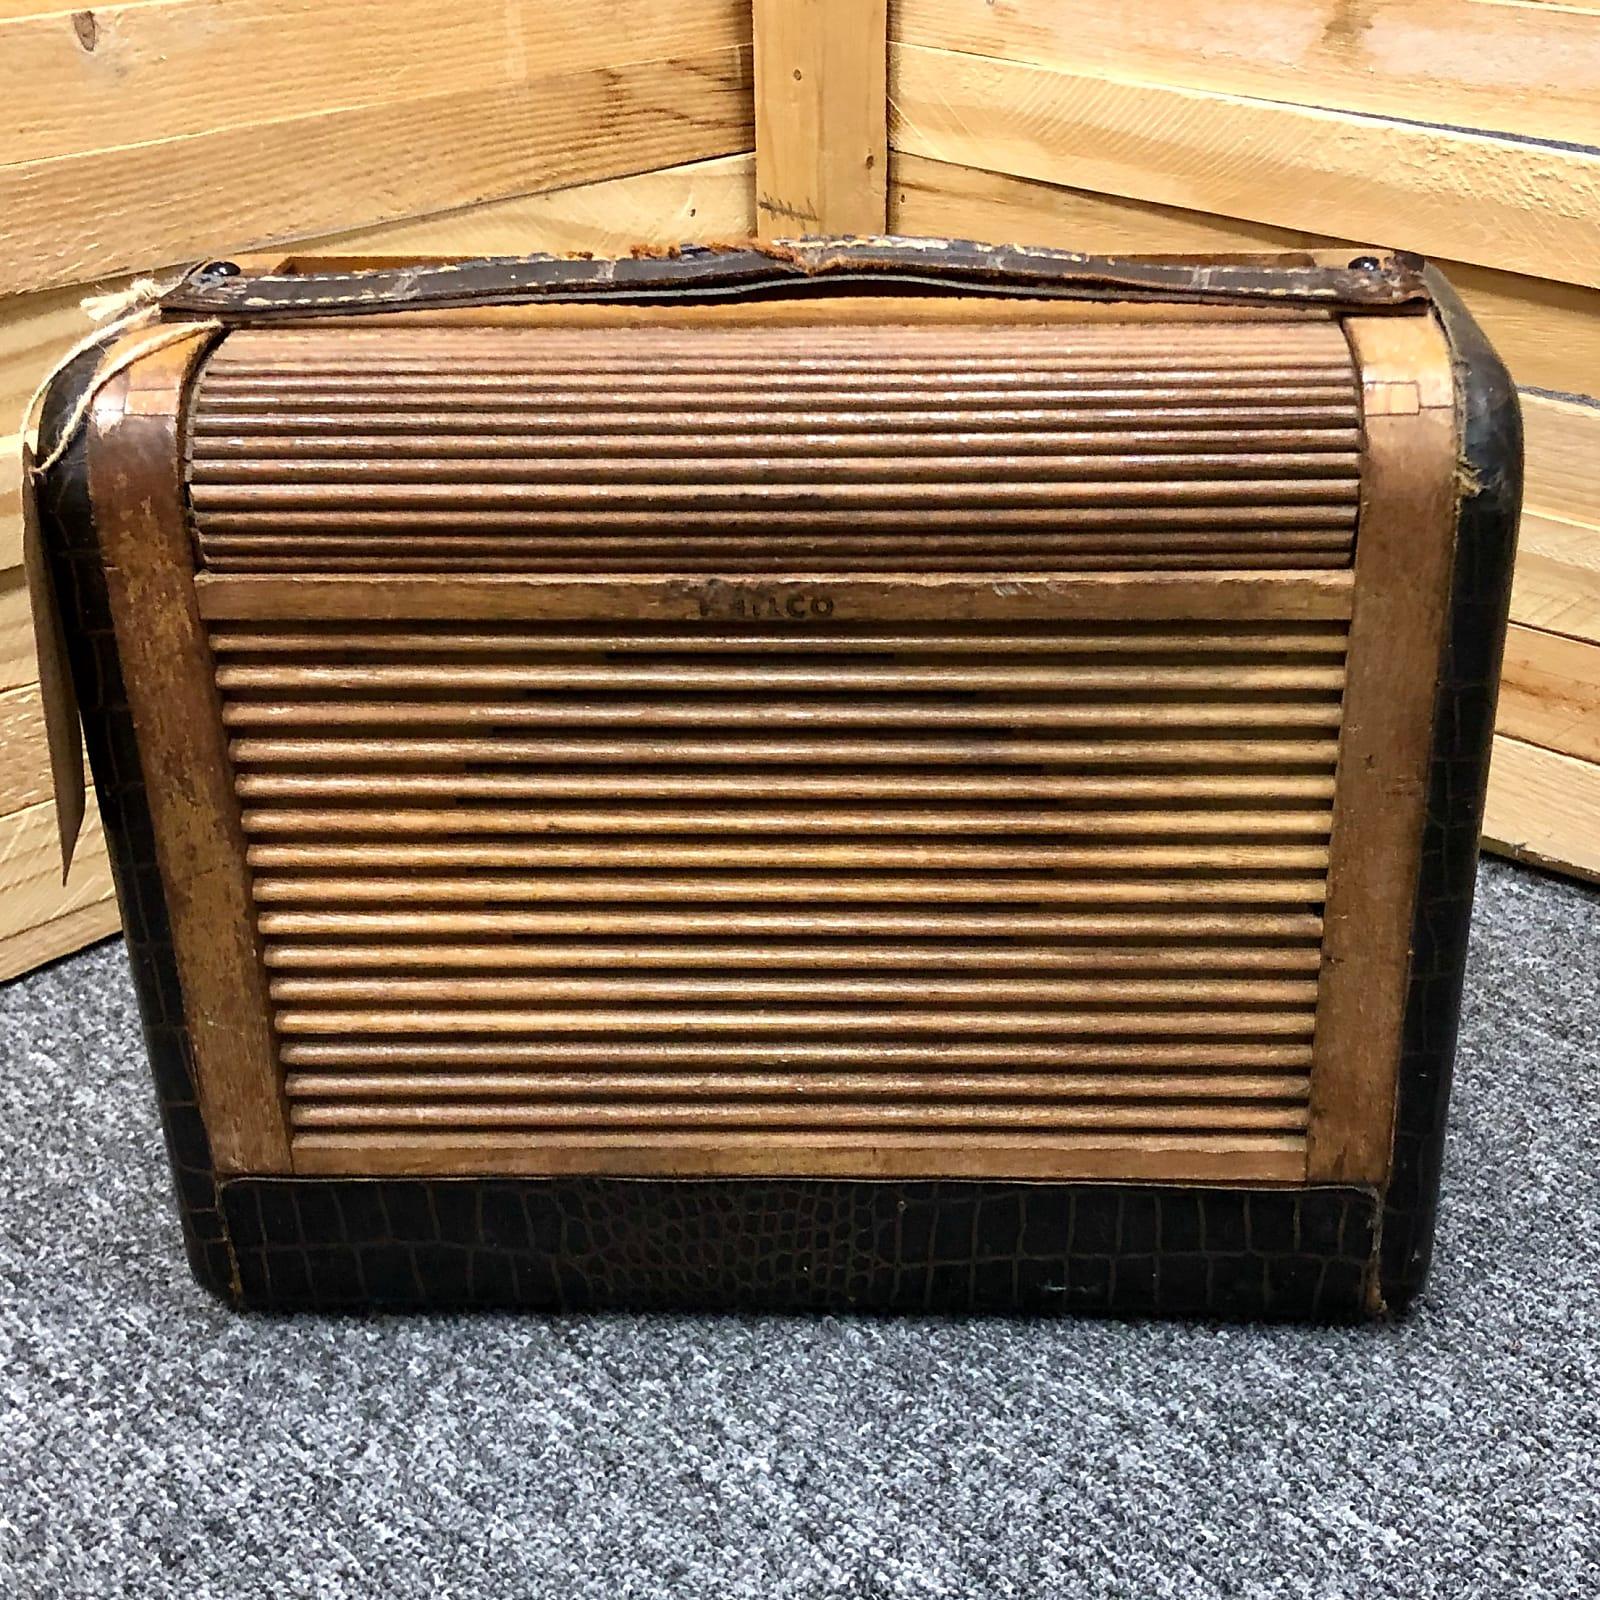 Rick Crownover Mini Guitar Amp using vintage Philco Radio box